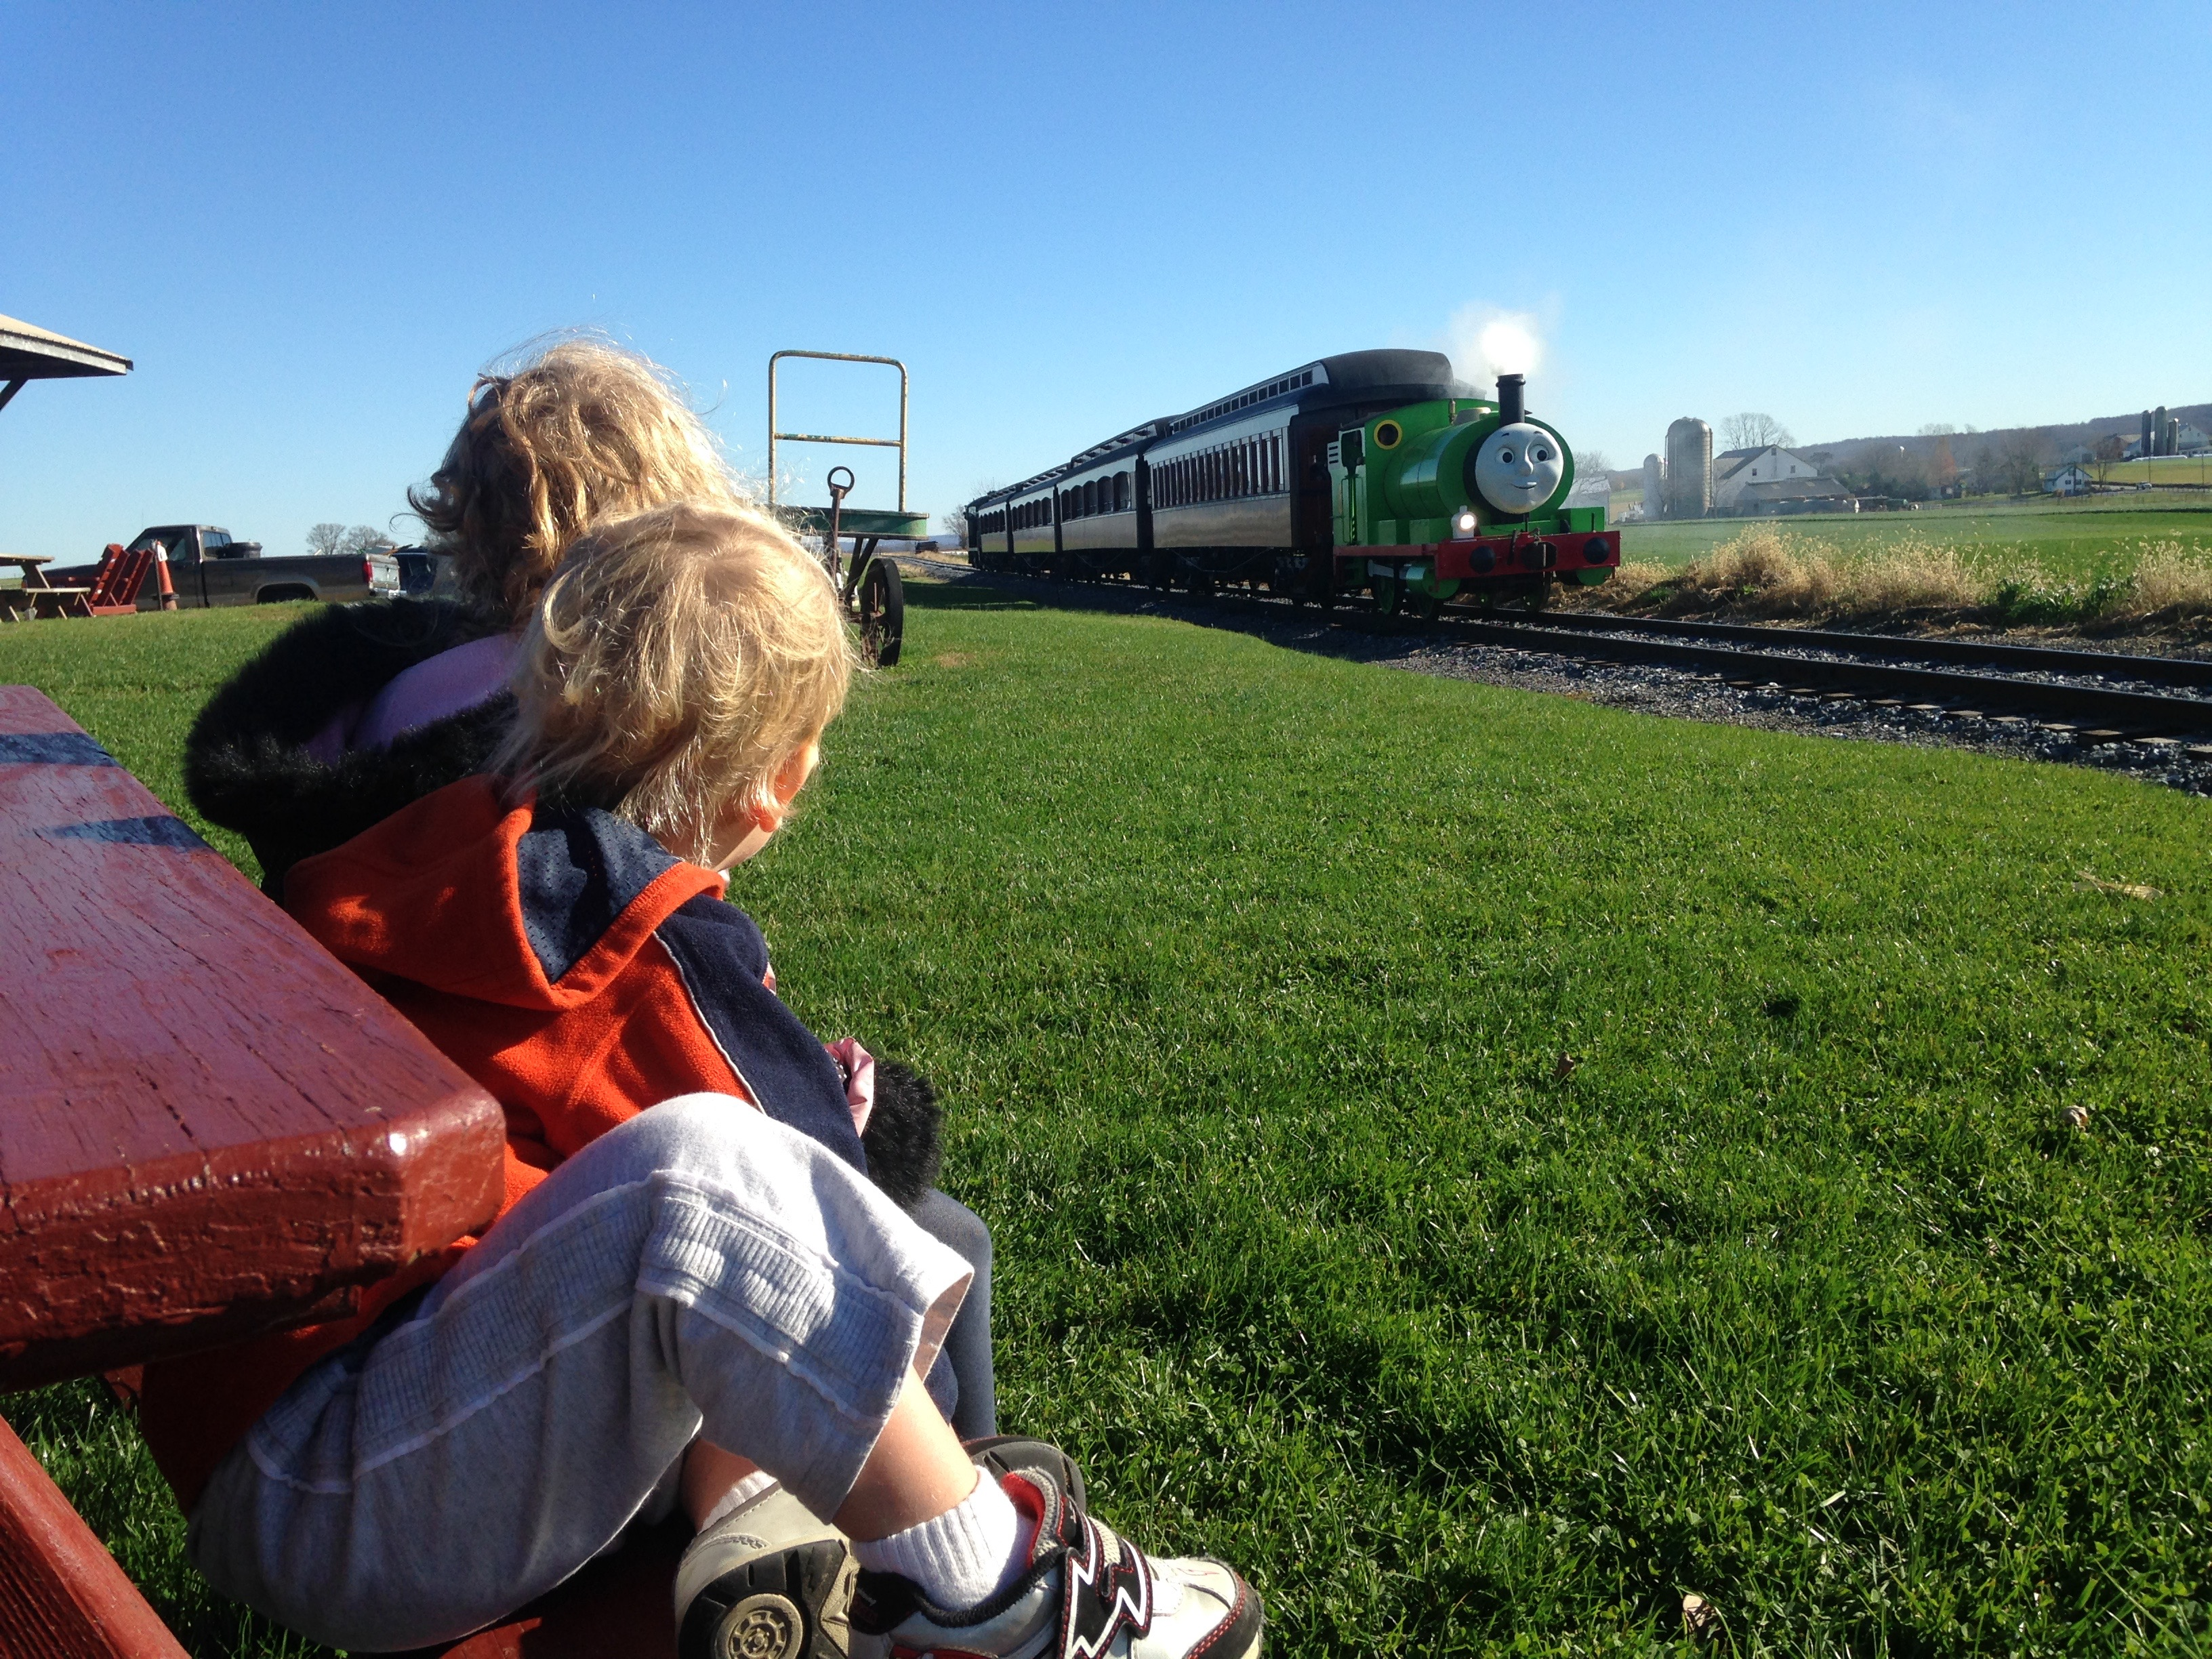 thomas the train at strasburg railroad